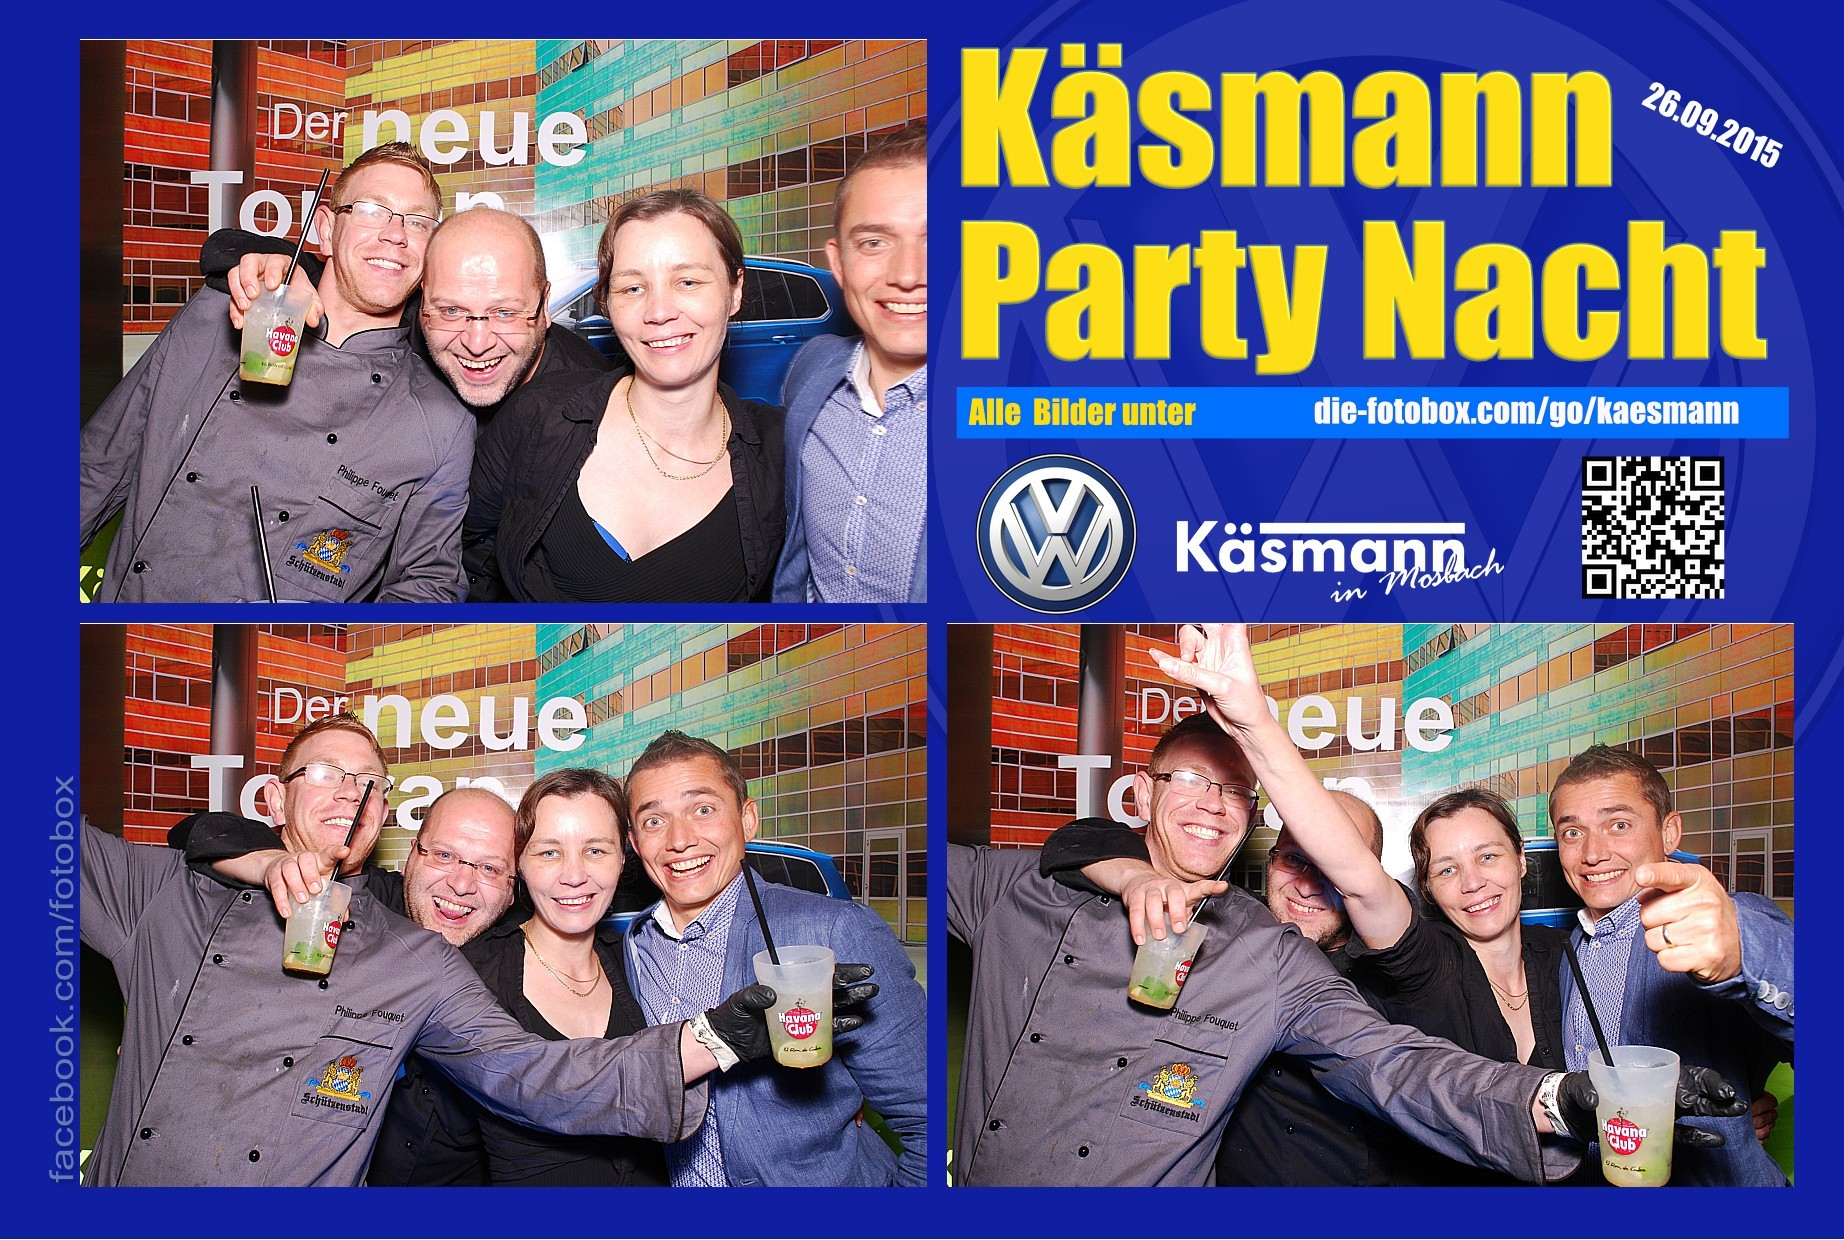 Käsmannparty 2015 - www.die-fotobox.com 01380